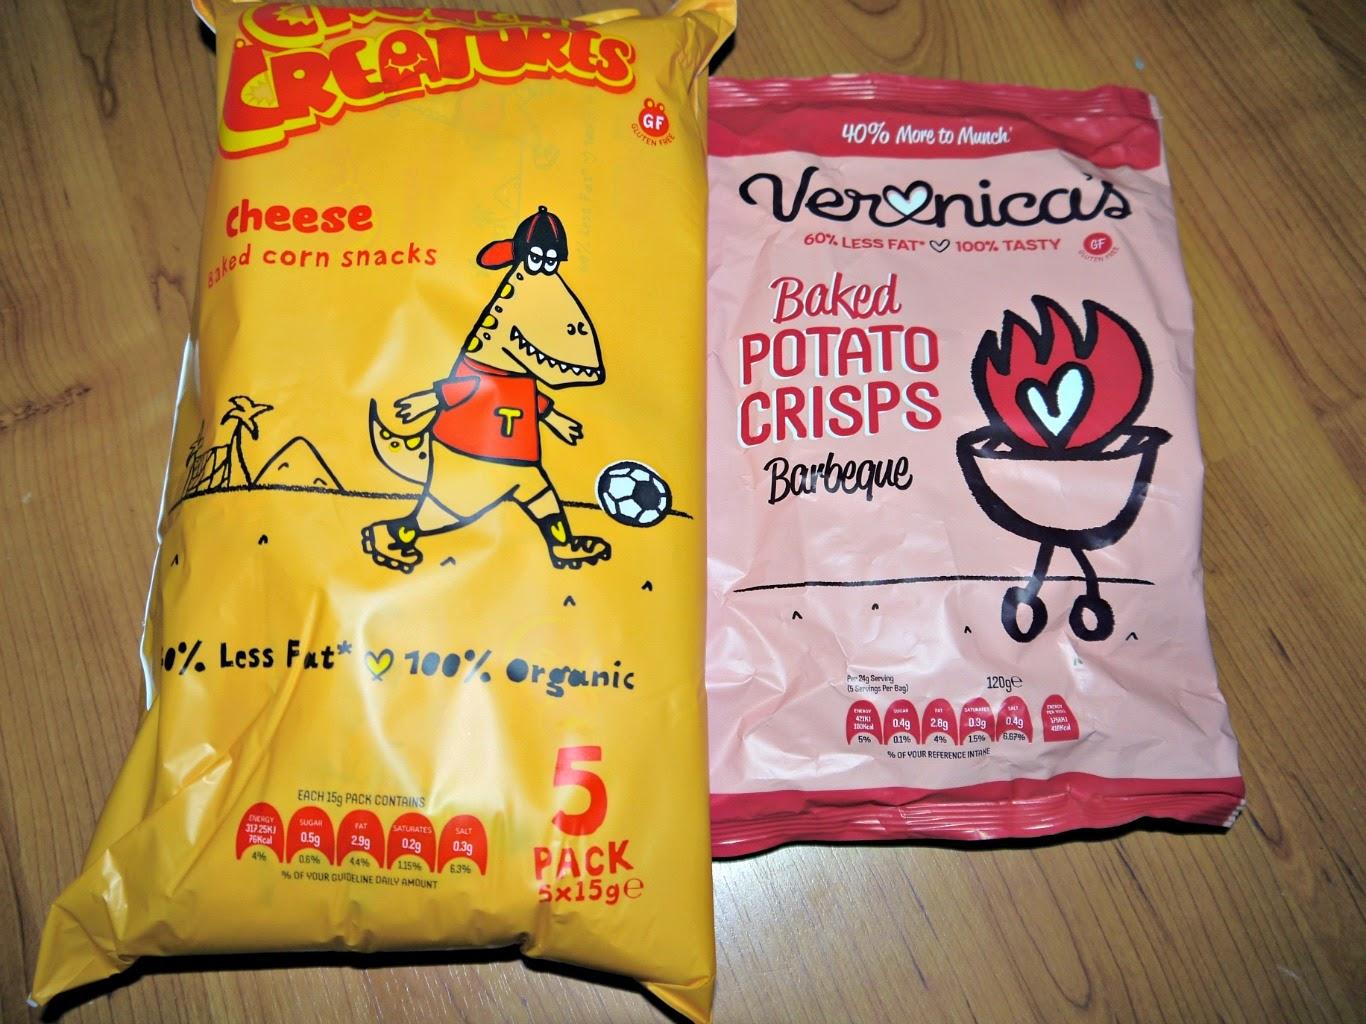 snacks, healthier crisps